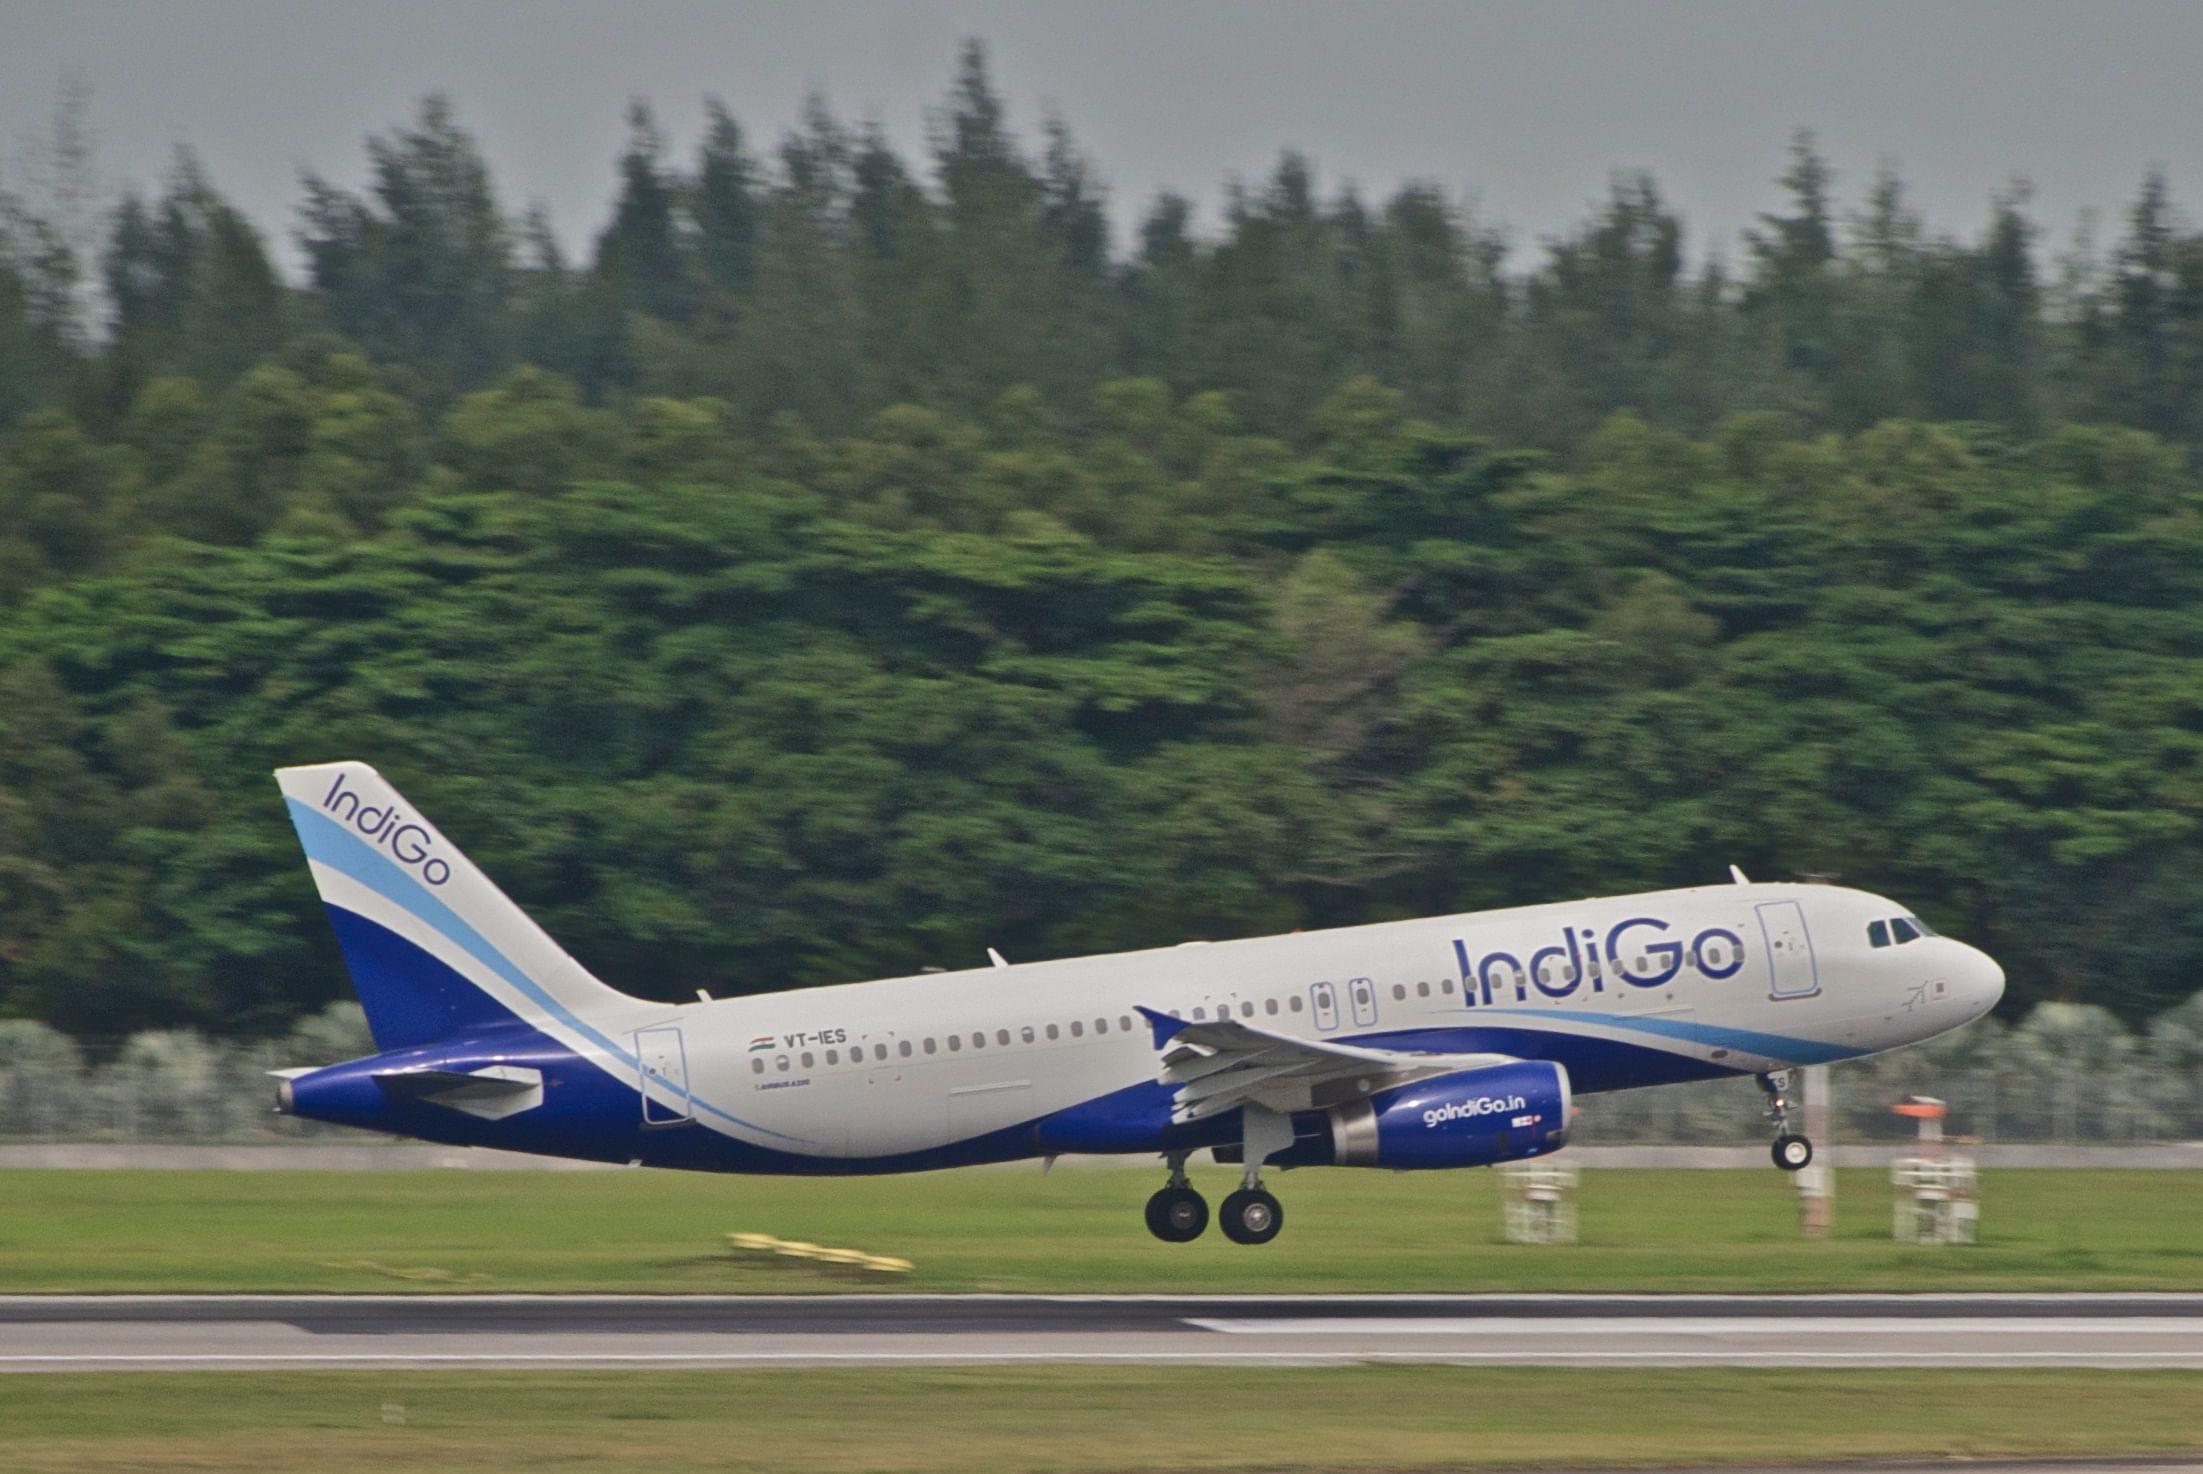 """IndiGo Airbus A320-232; VT-IES@SIN;02.08.2012 668ey (7917210650)"" by Aero Icarus from Zürich, Switzerland -"